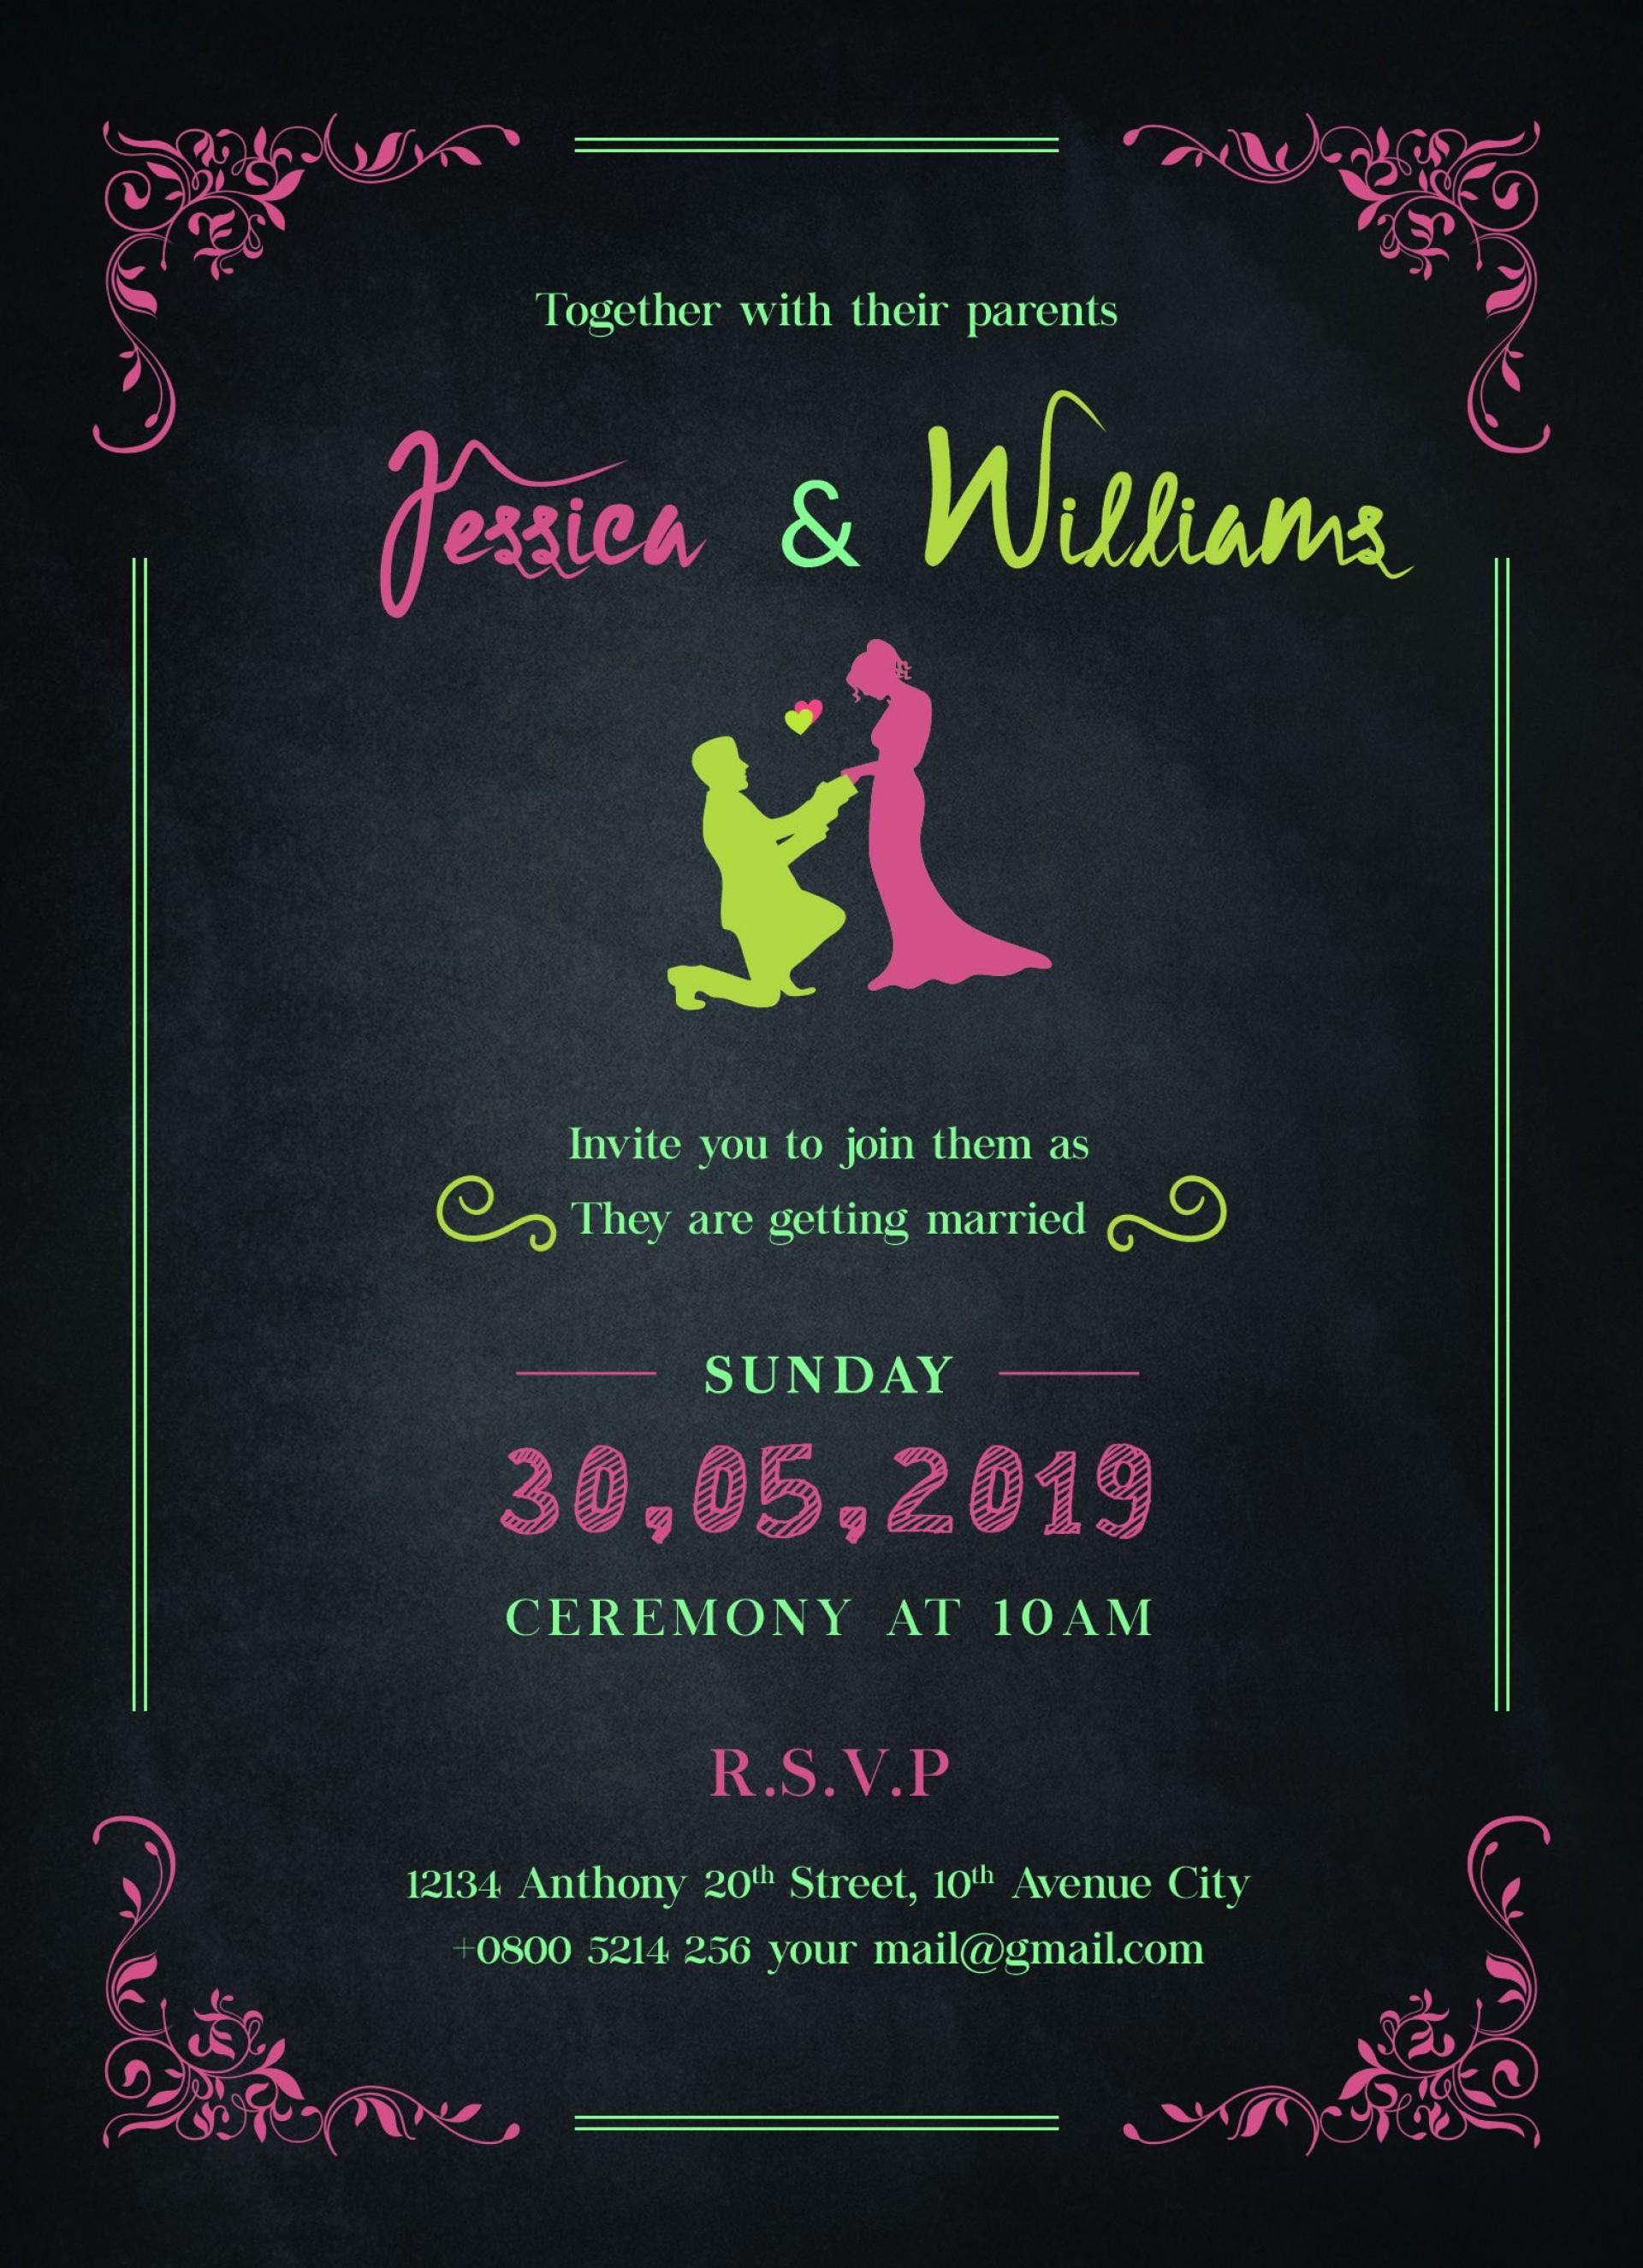 009 Impressive Sample Wedding Invitation Template Free Download Concept  Wording1920